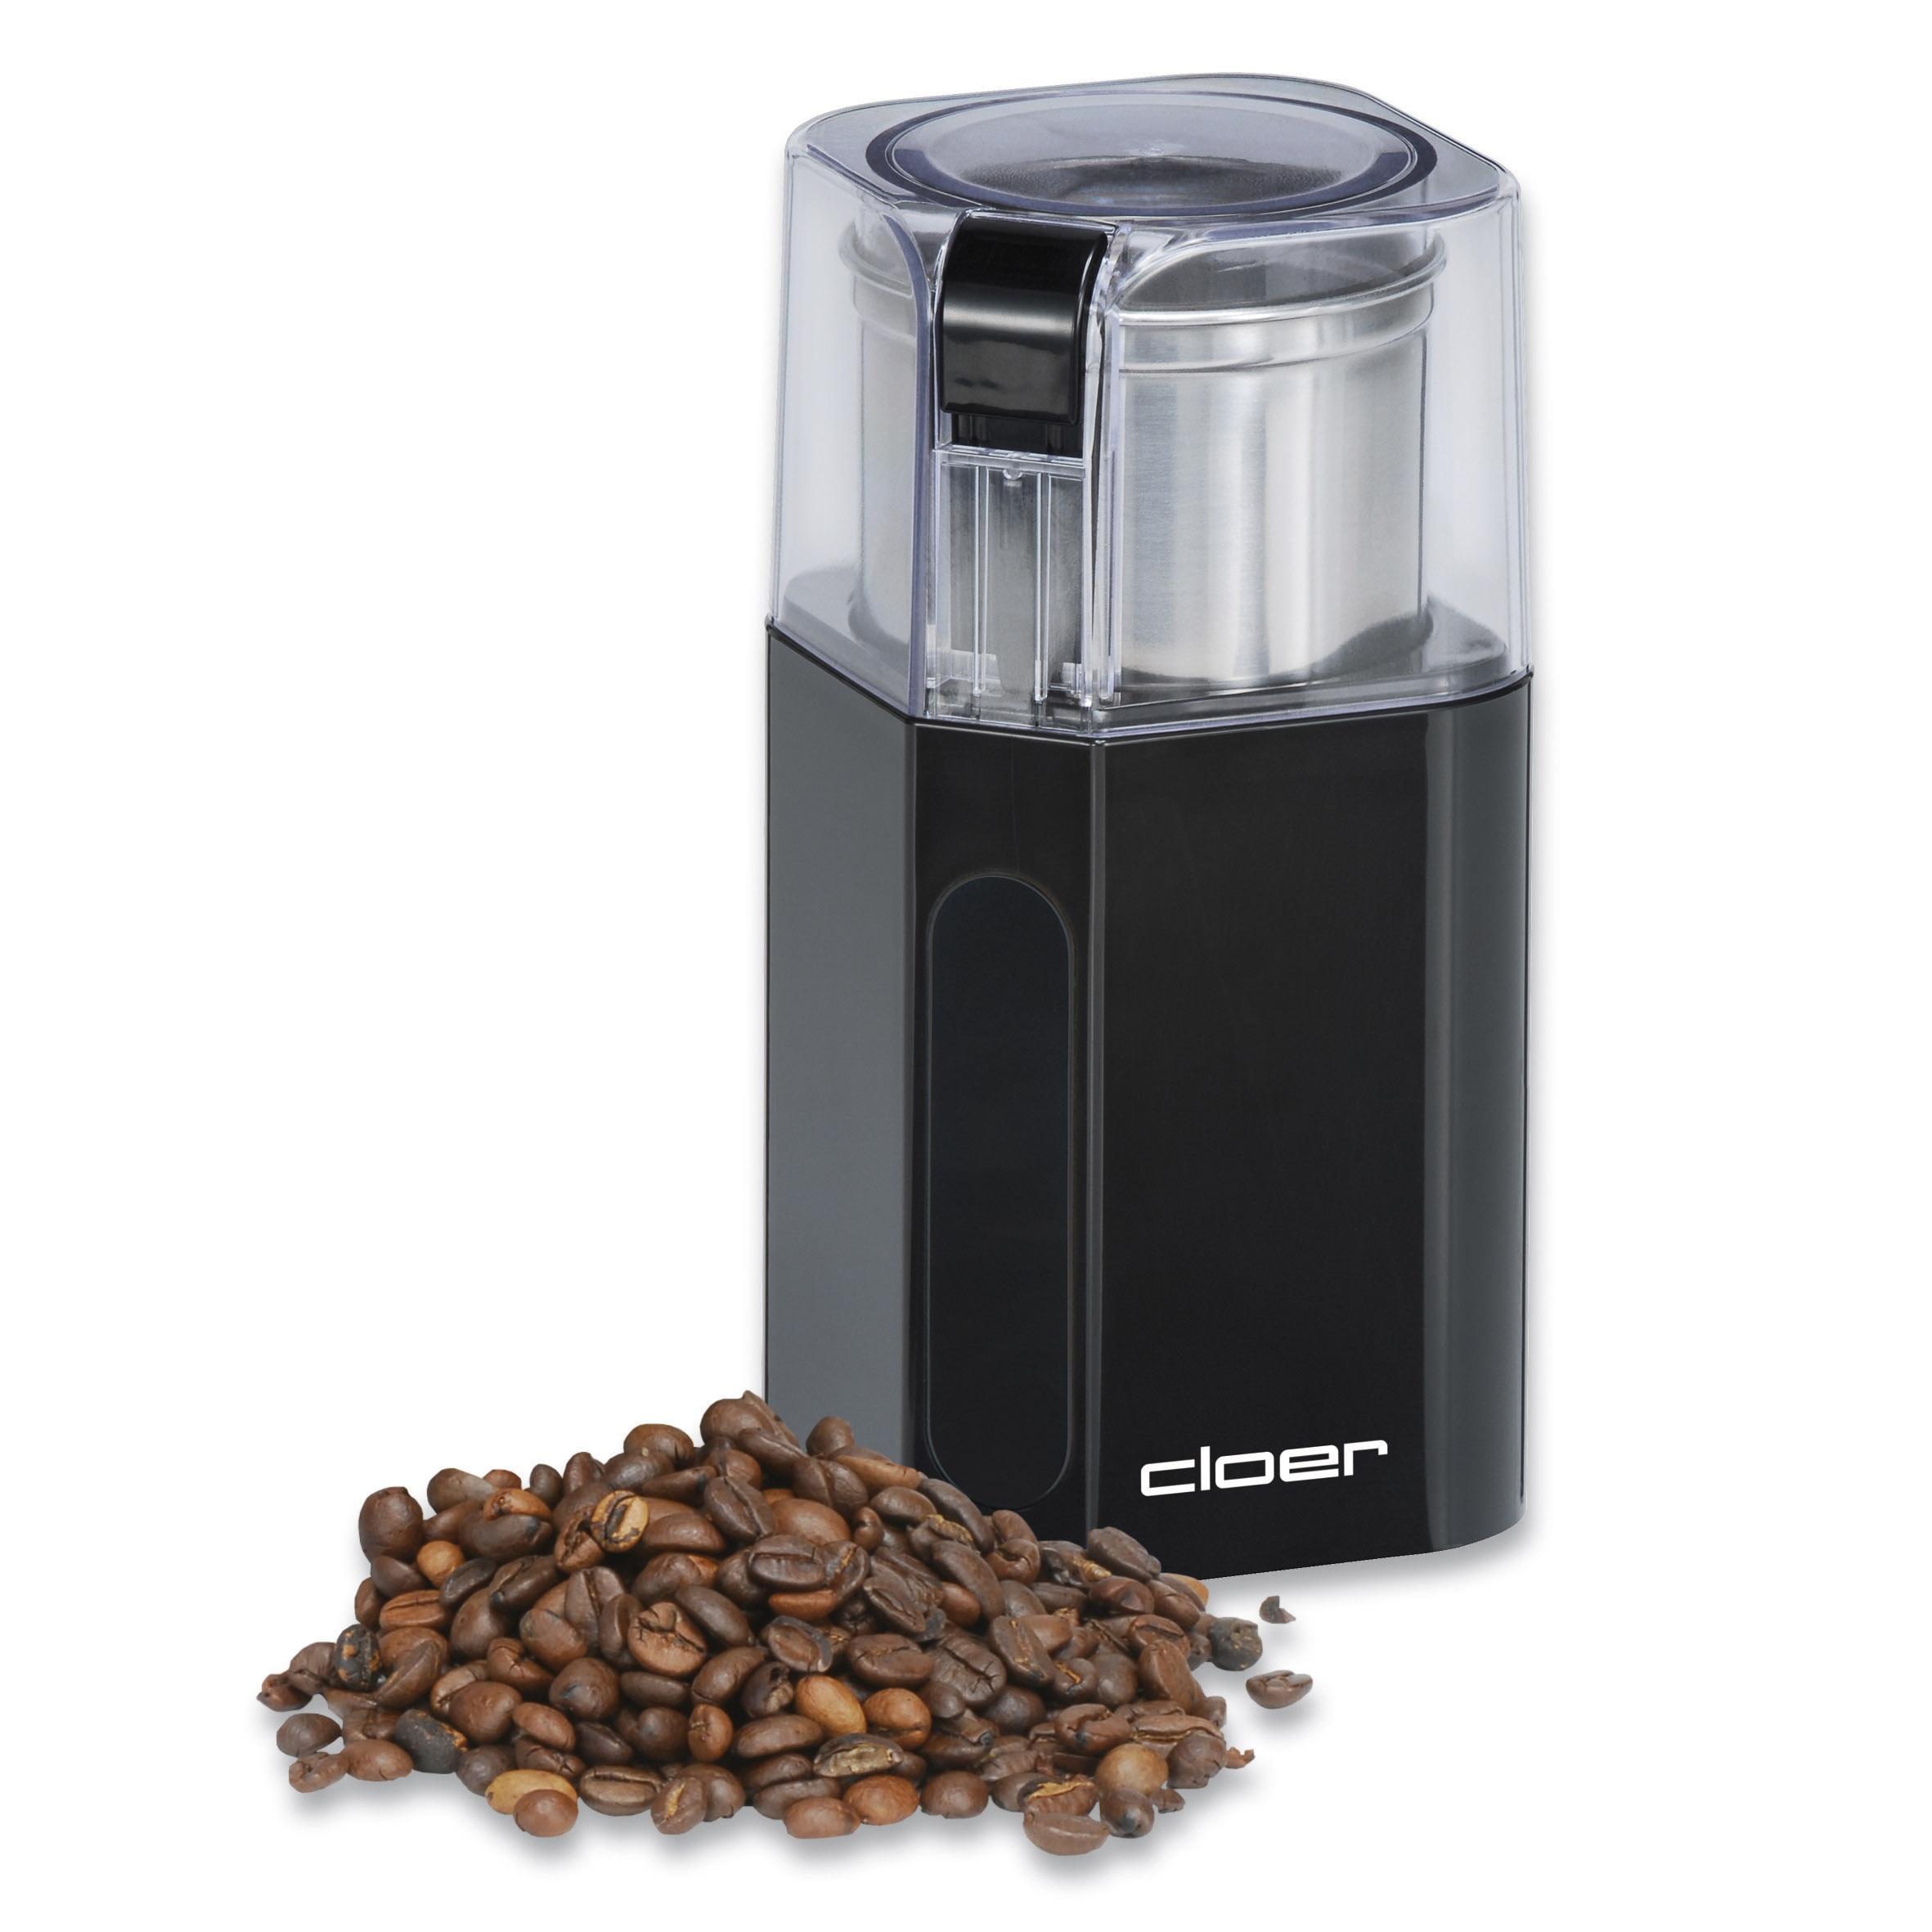 Amazon.de: Cloer 7580 Elektrische Kaffeemühle